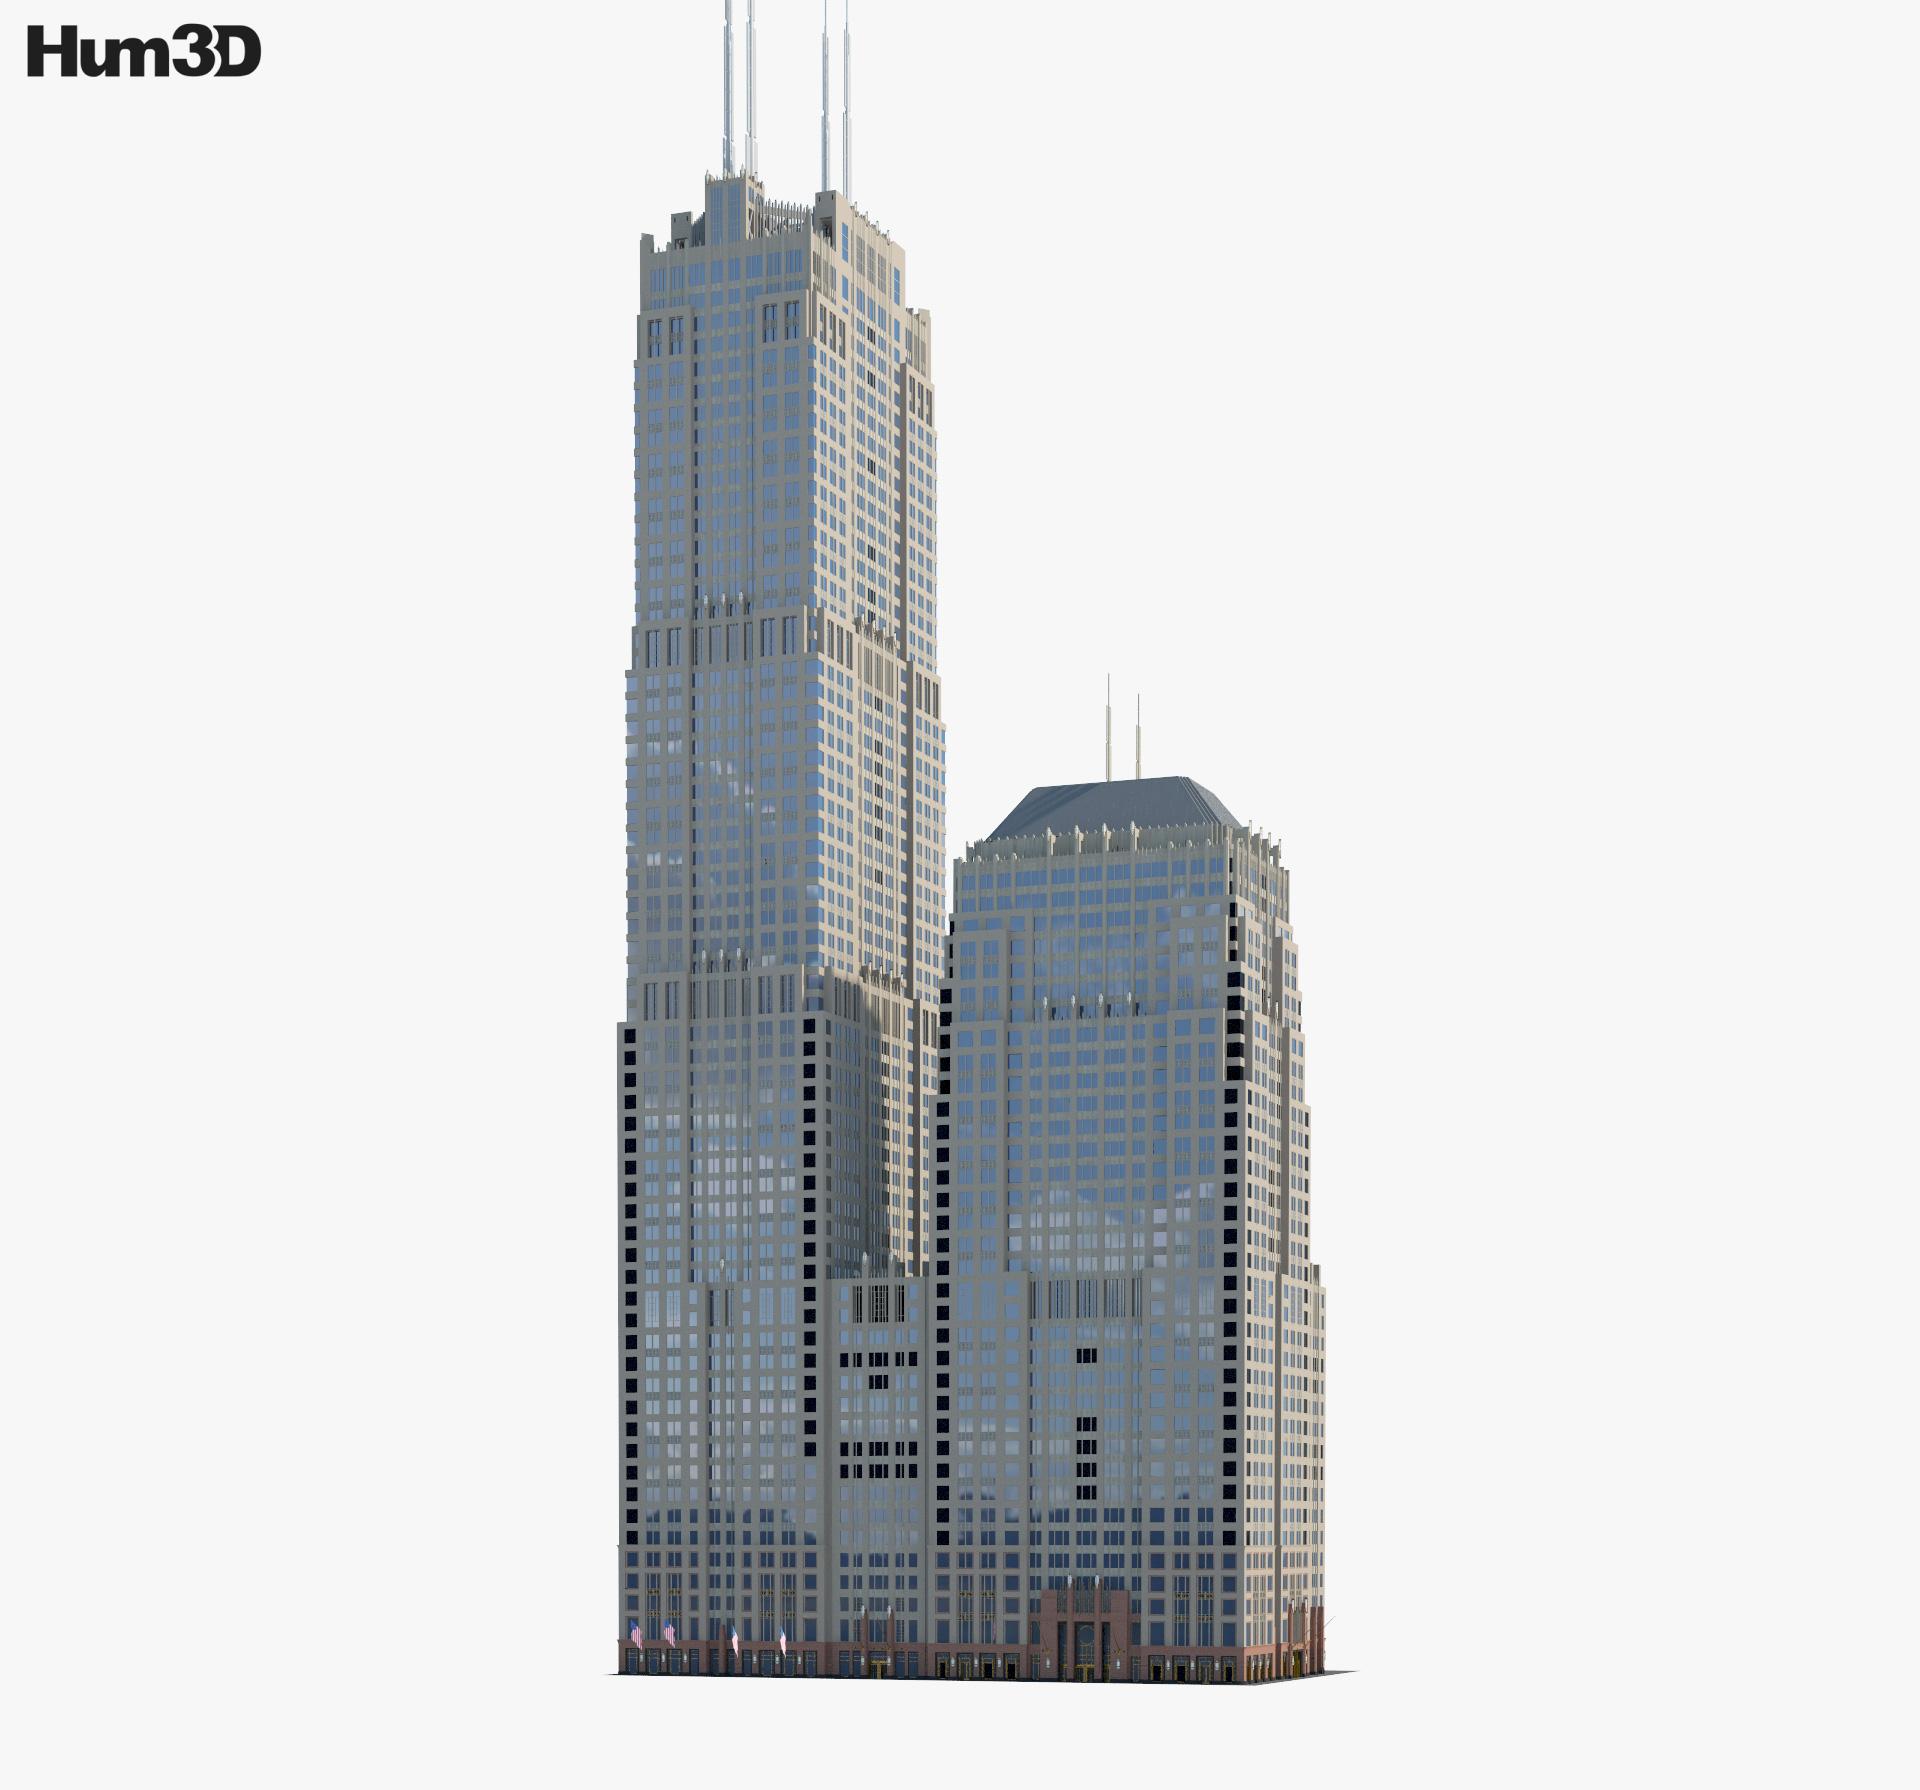 3D model of Franklin Center